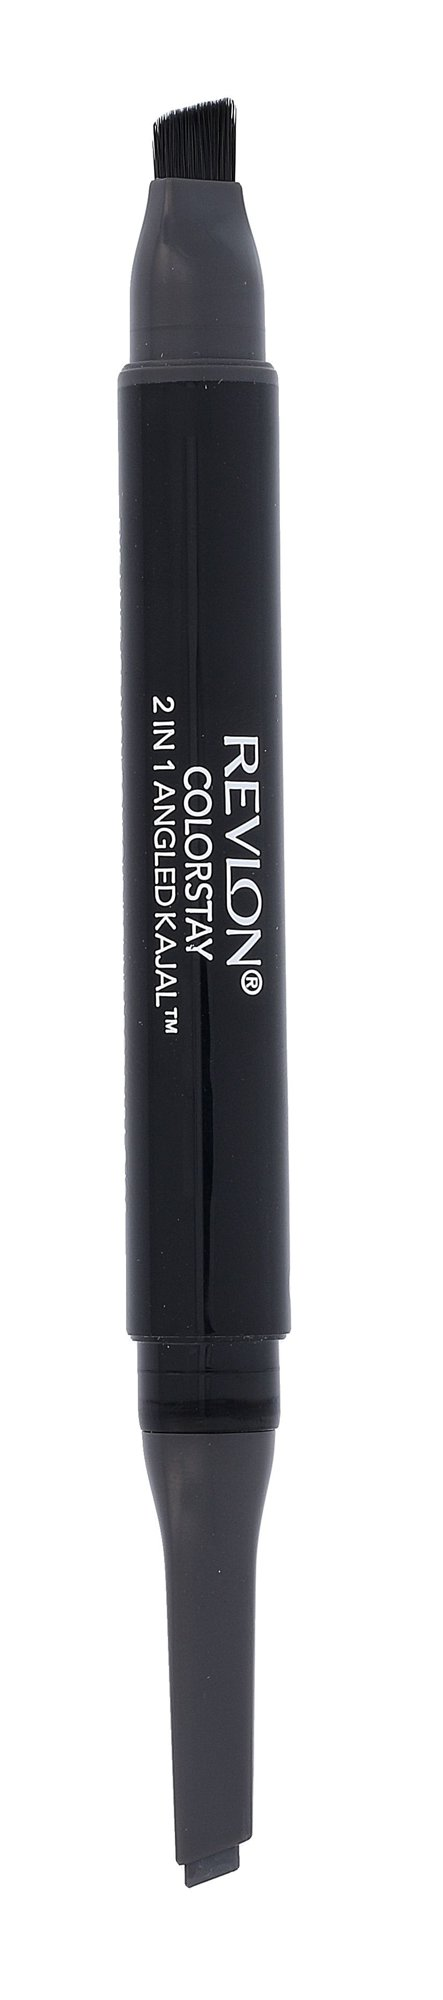 Revlon Colorstay Cosmetic 0,28ml 104 Graphite